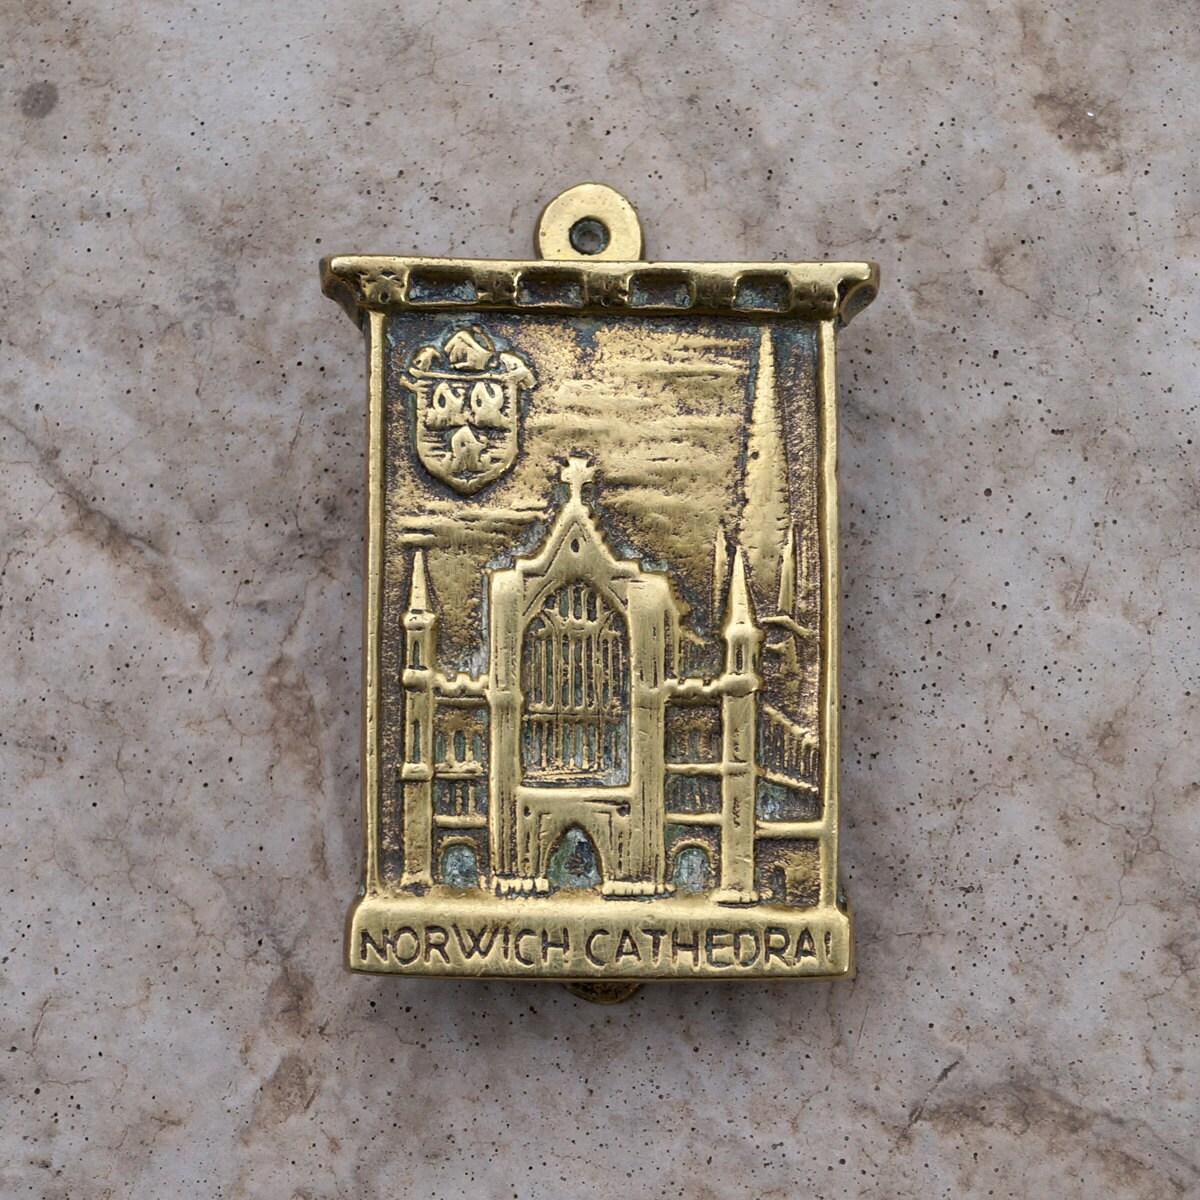 Brass norwich cathedral door knocker vintage - Vintage brass door knocker ...